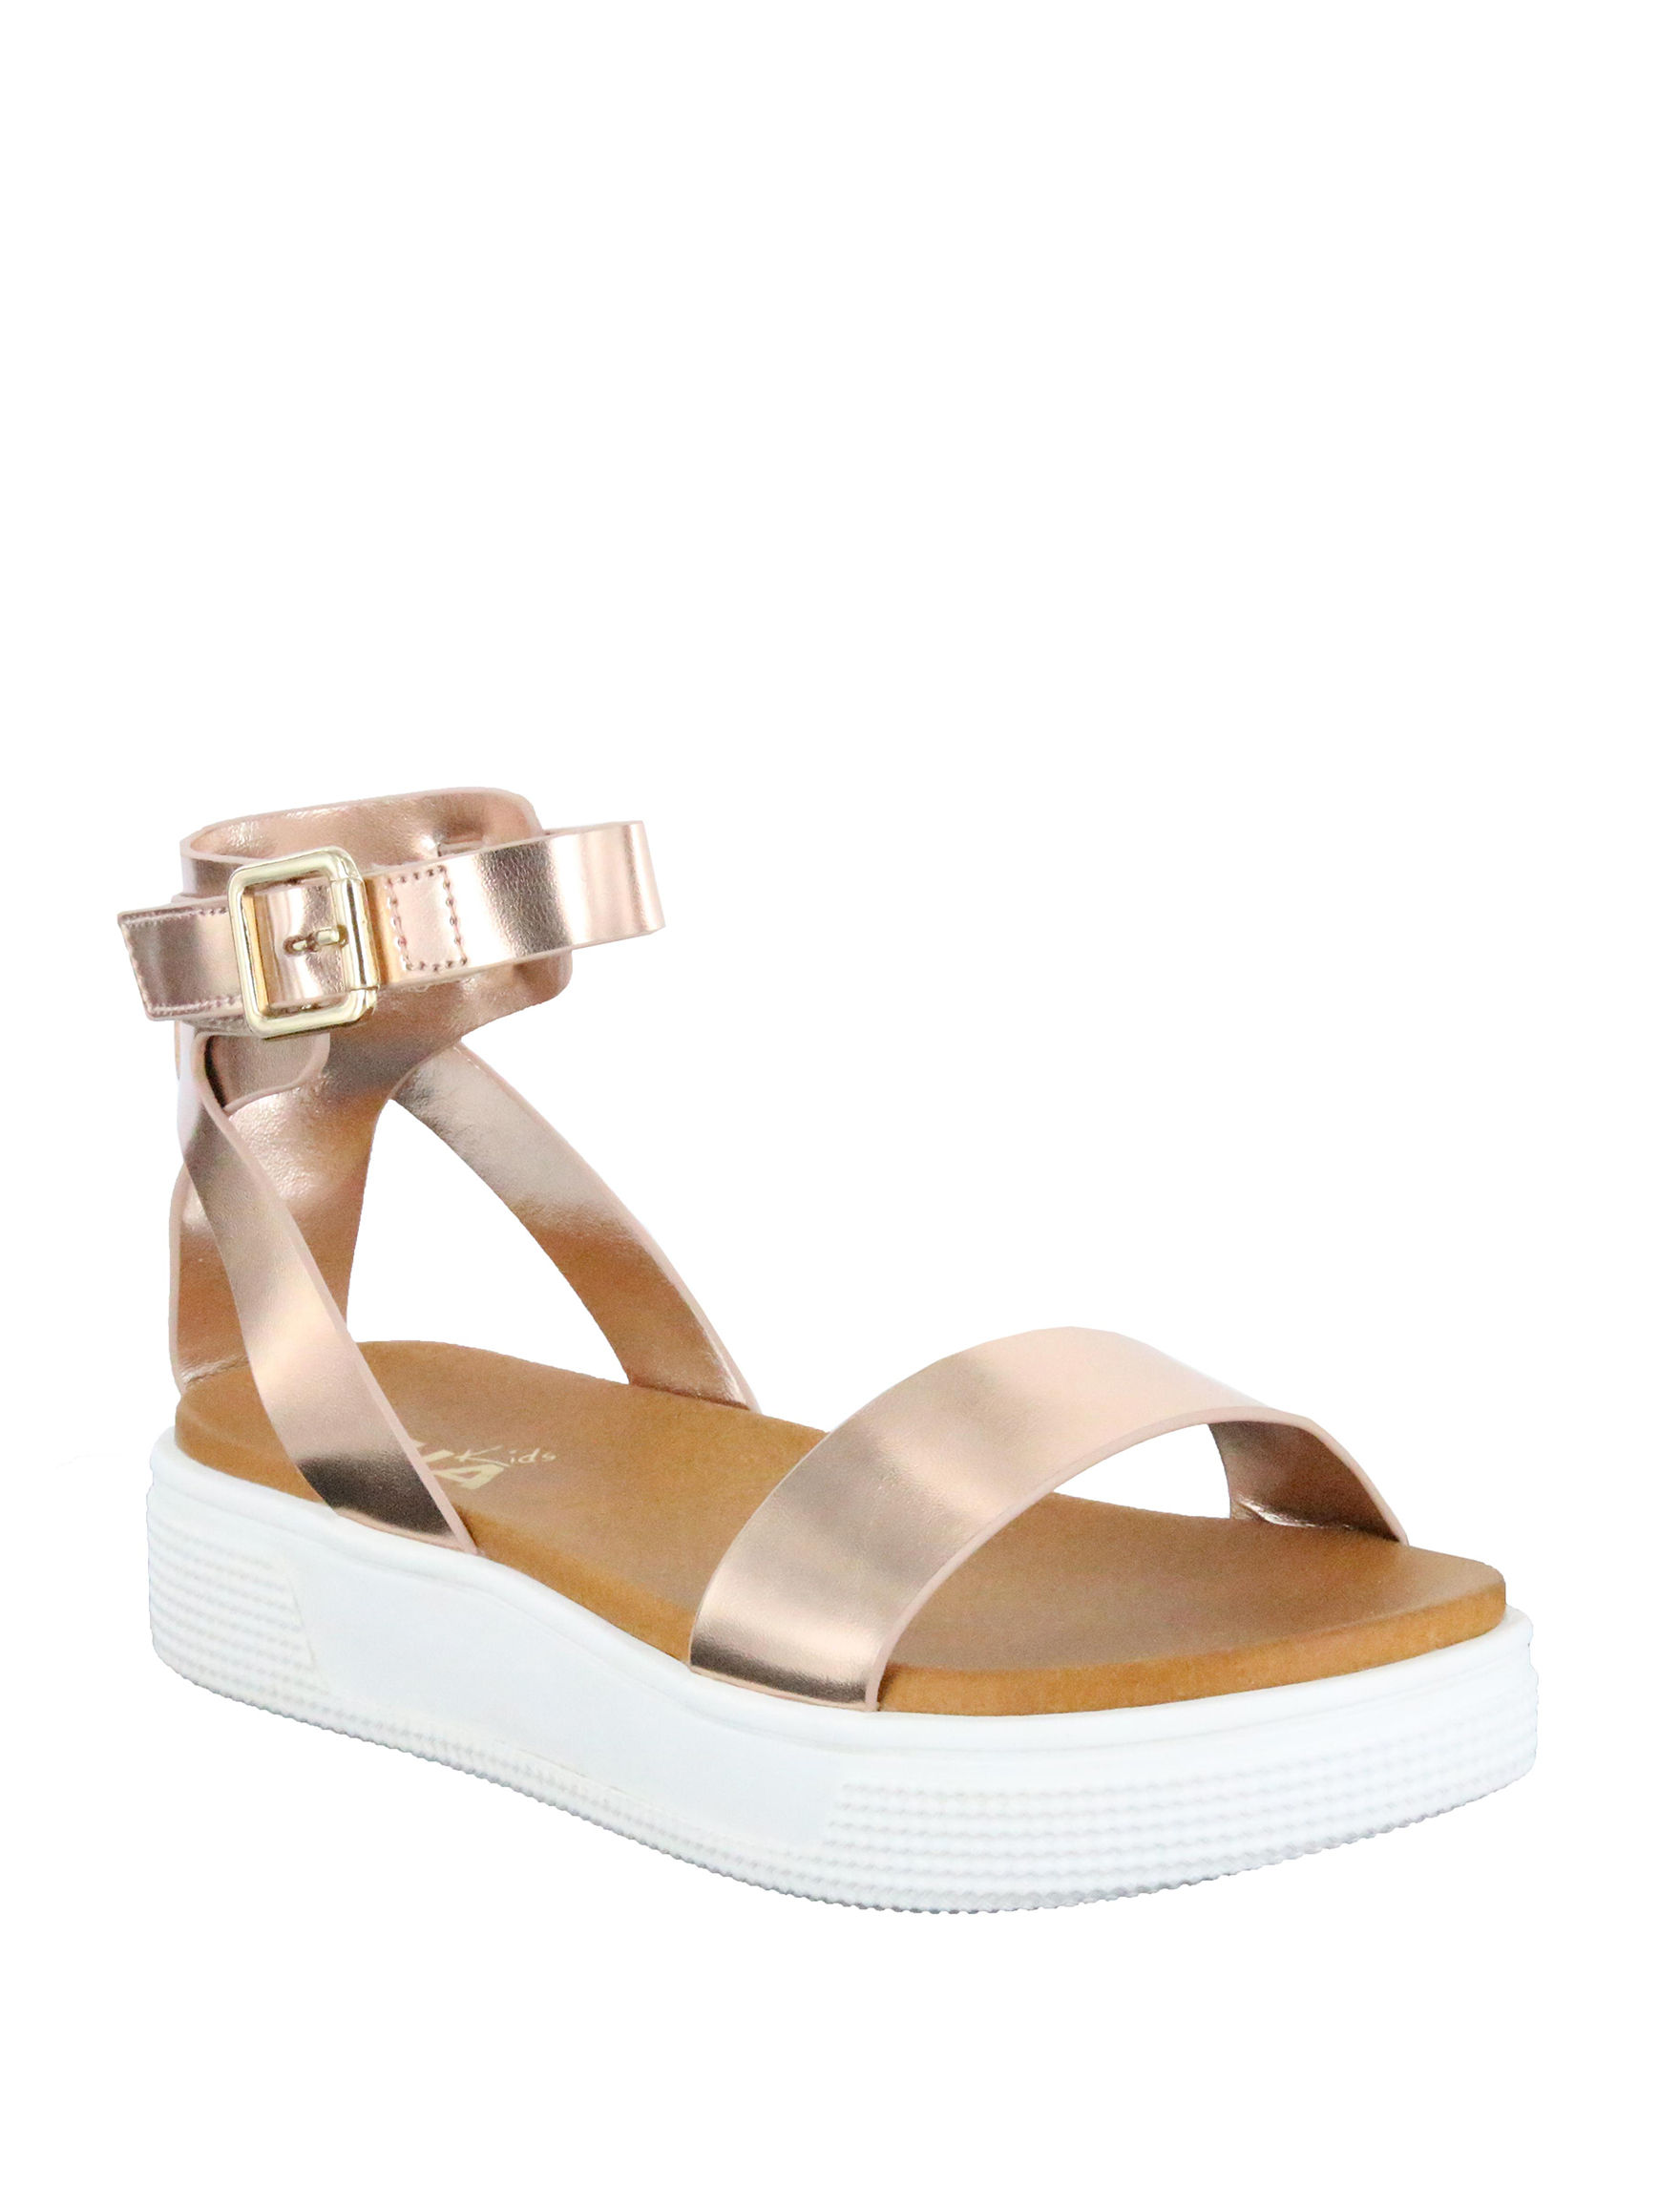 MIA Rose Gold Flat Sandals